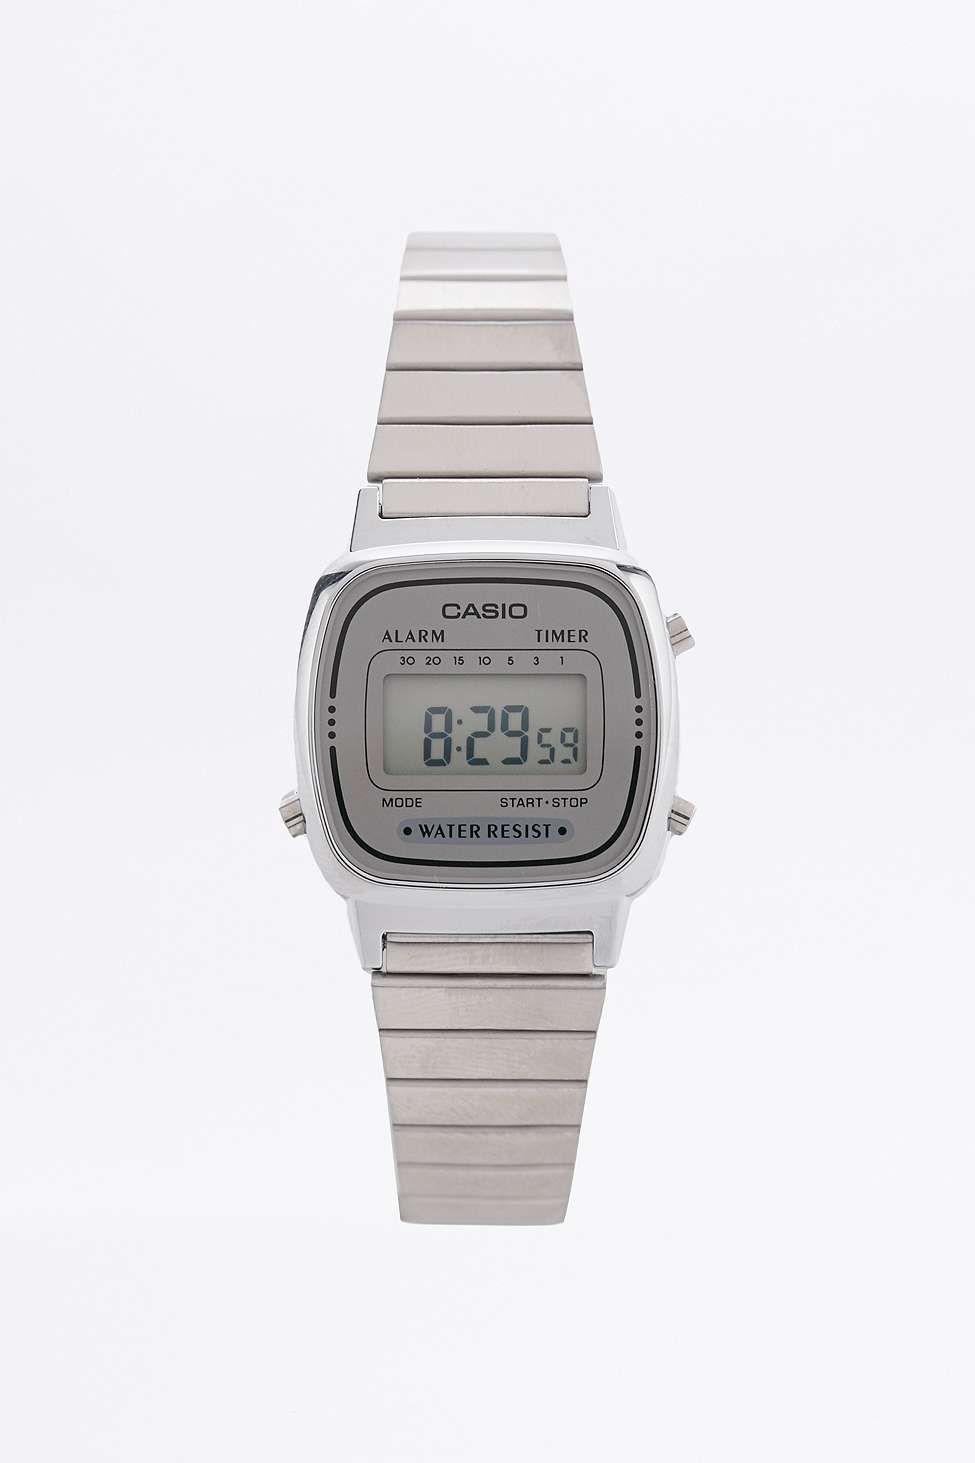 Casio Silver Mini Digital Watch   Urban Outfitters   Pinterest ... d6161d9777